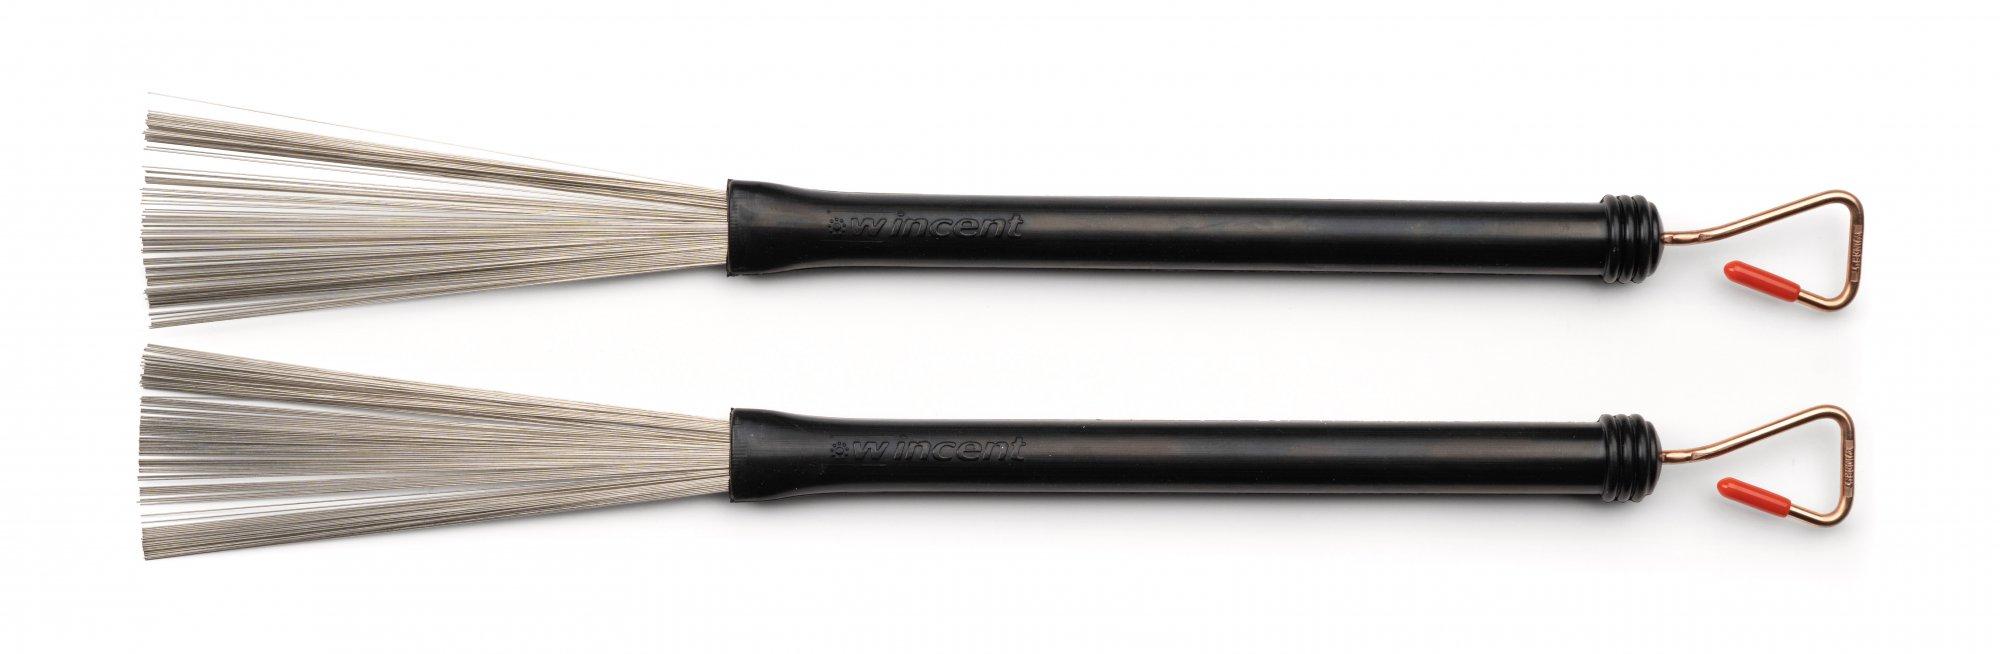 Wincent W33M Pro Brush Medium Steel Wire Brushes